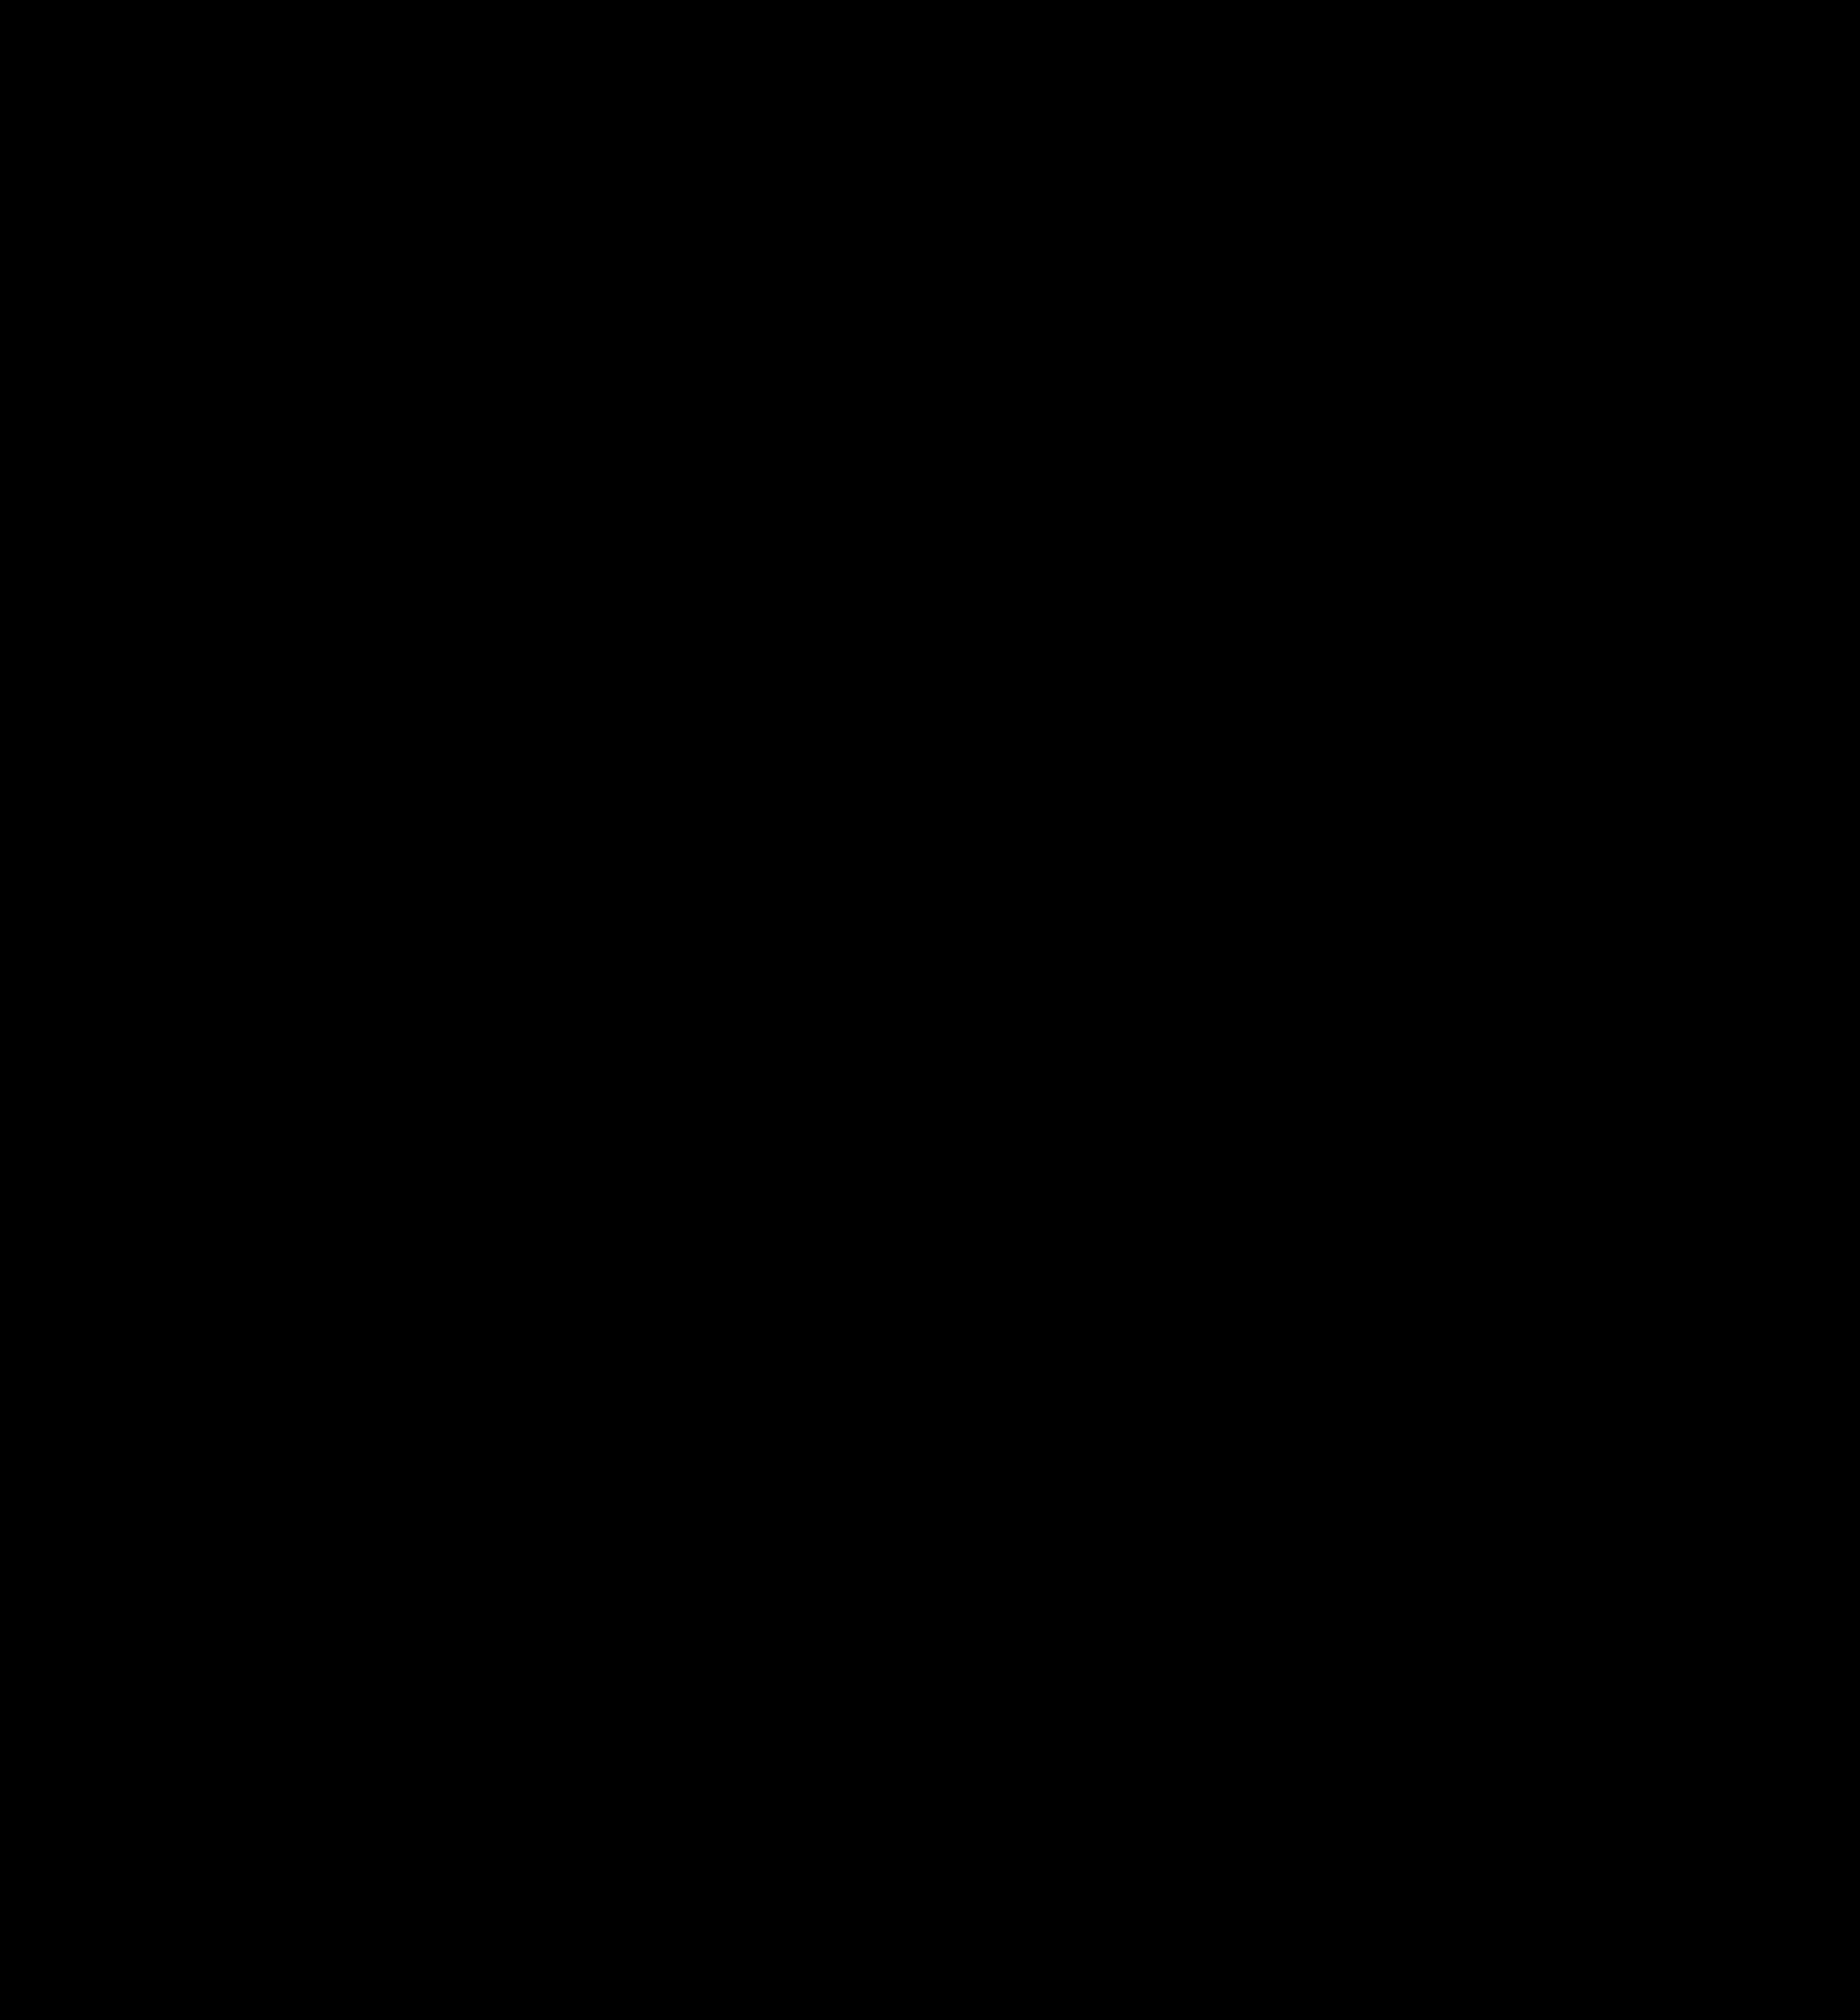 Phoenix clipart silhouette Clipart Monkey (PNG) BIG IMAGE